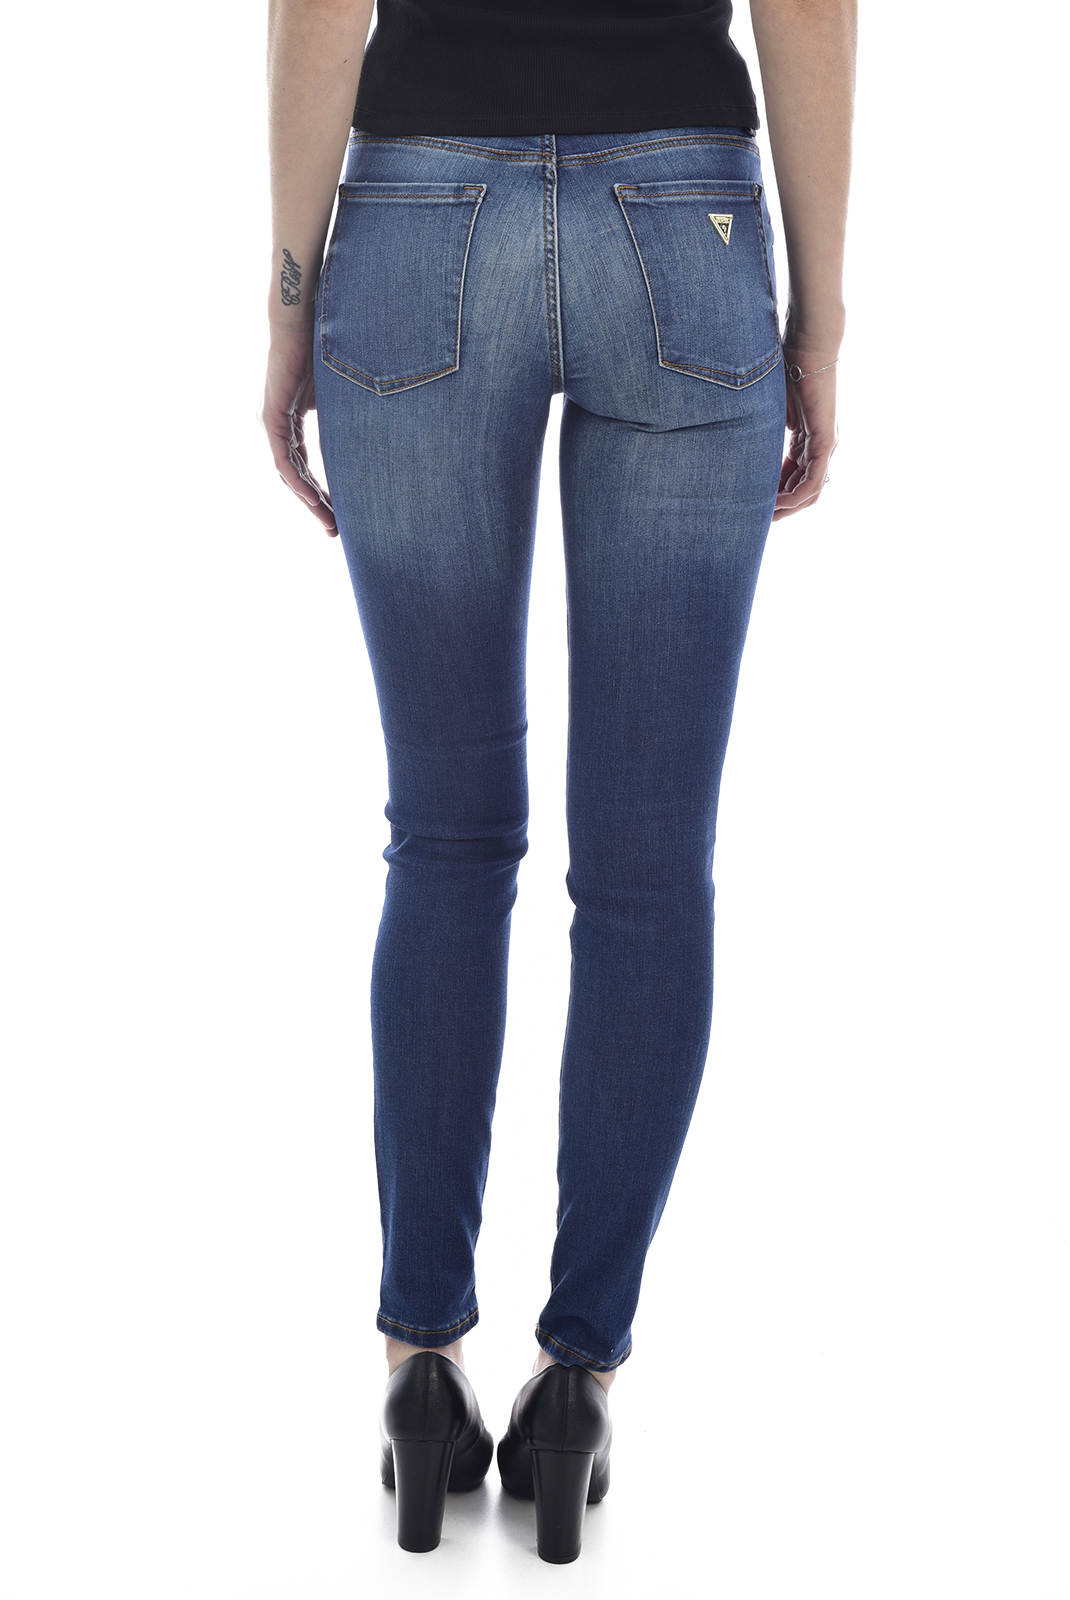 Jeans   Guess jeans W0GA99 D41F2 ANNETTE MROSMELROSE